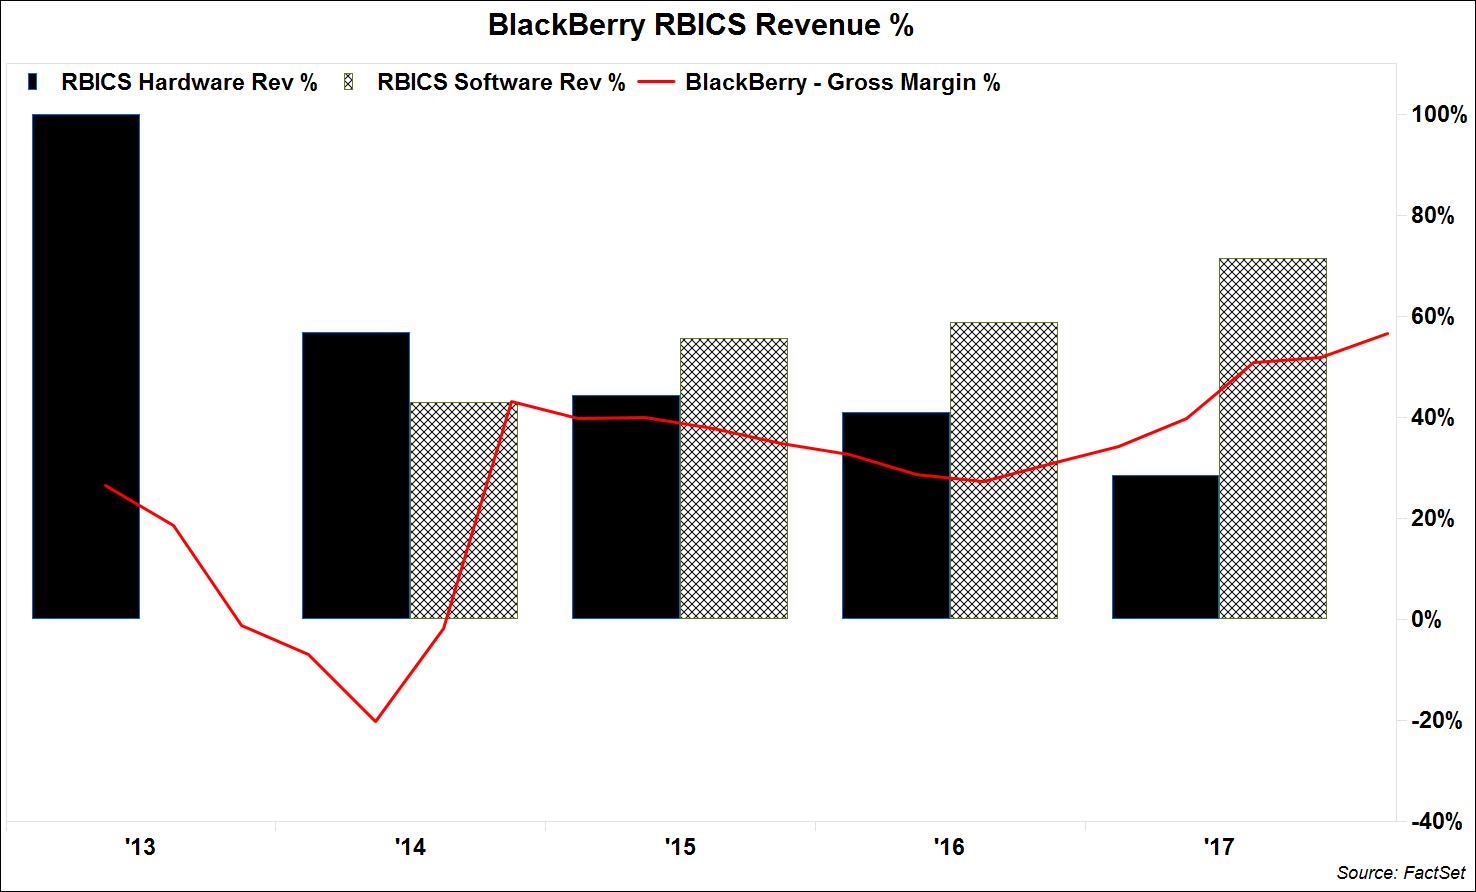 BlackBerry RBICS Revenue